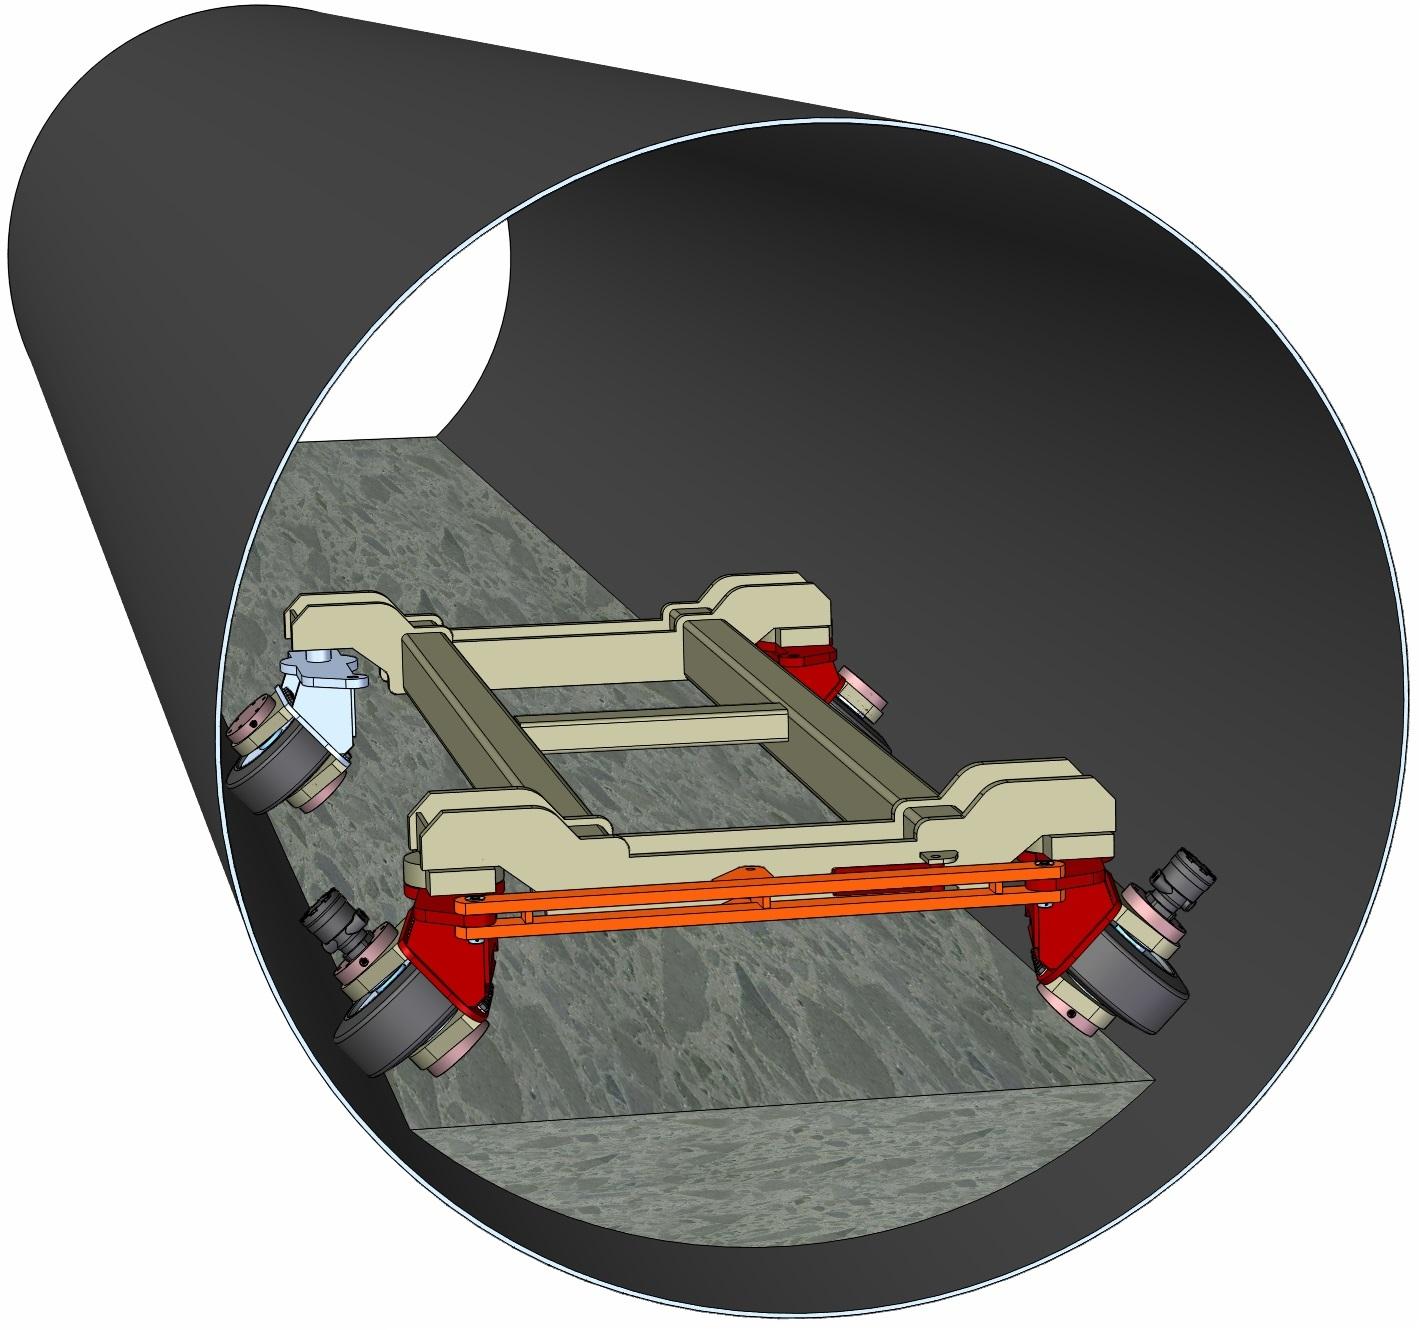 Self-propelled Concrete Bucket Carrier to Deposit Concrete Floor in 120 Inch Diameter Steel Pipe Tunnel